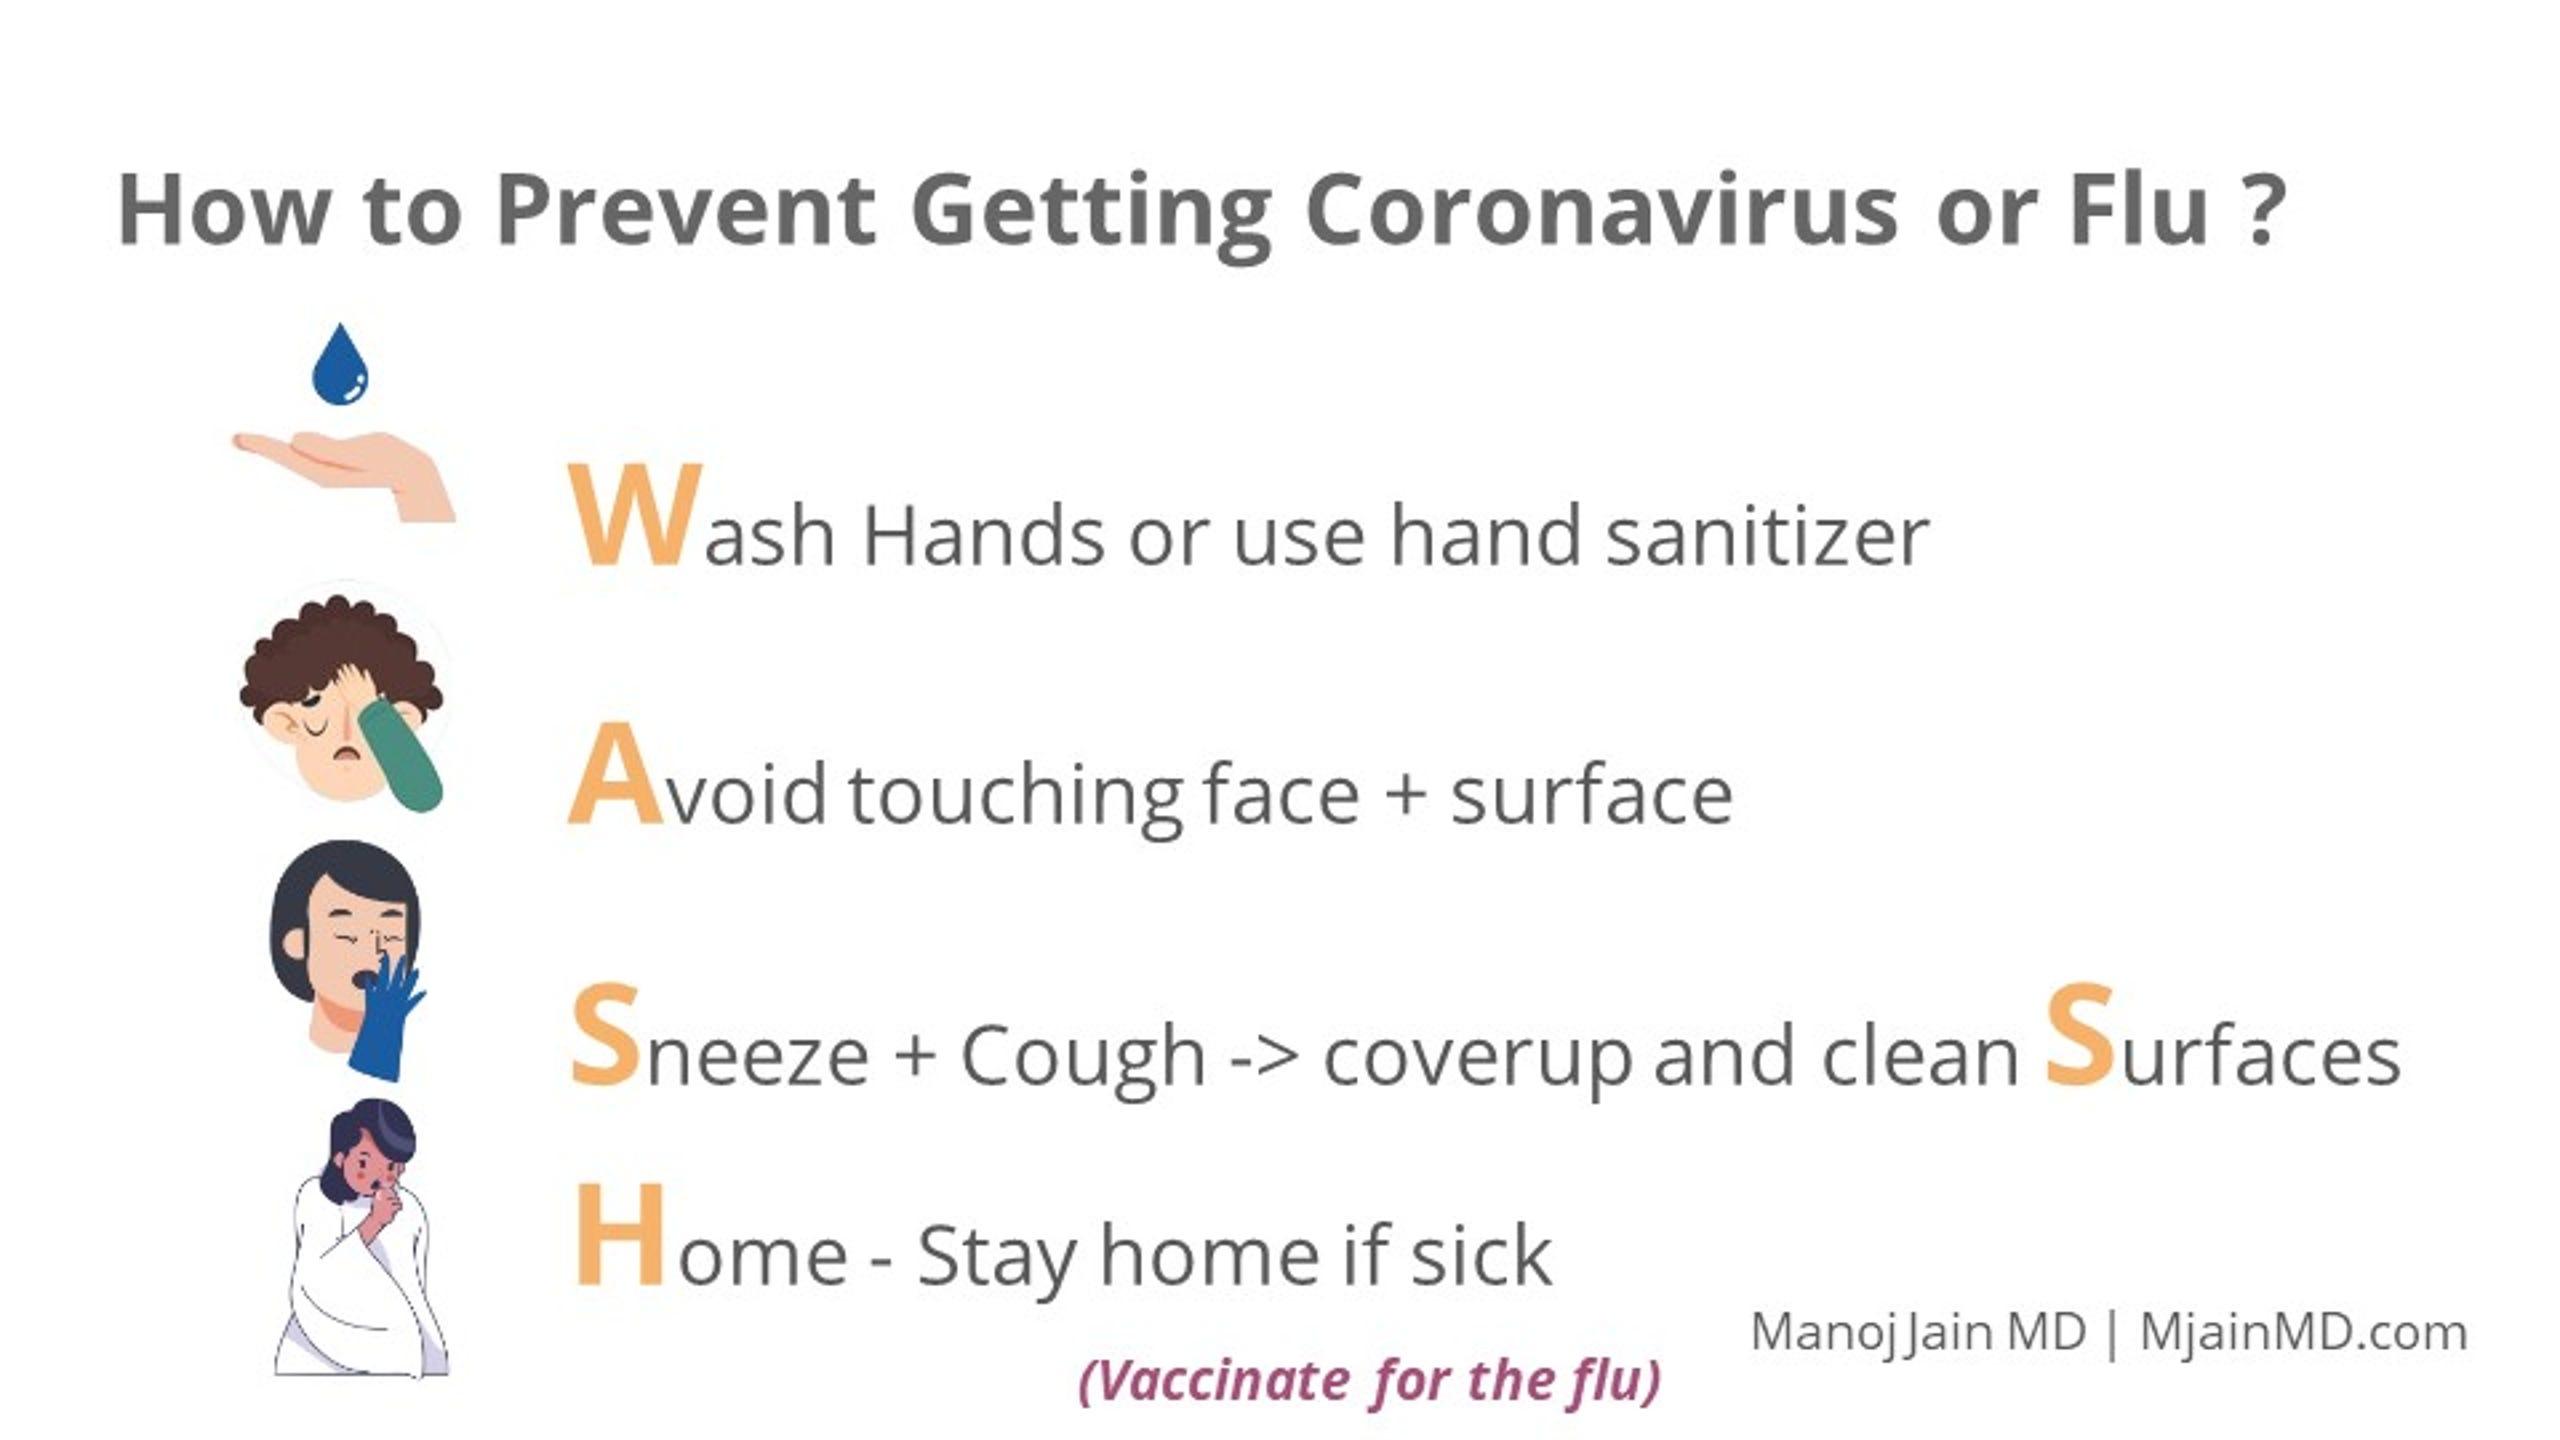 Coronavirus Response PowerPoint presentation by Dr. Manoj Jain and Alisa Haushalter